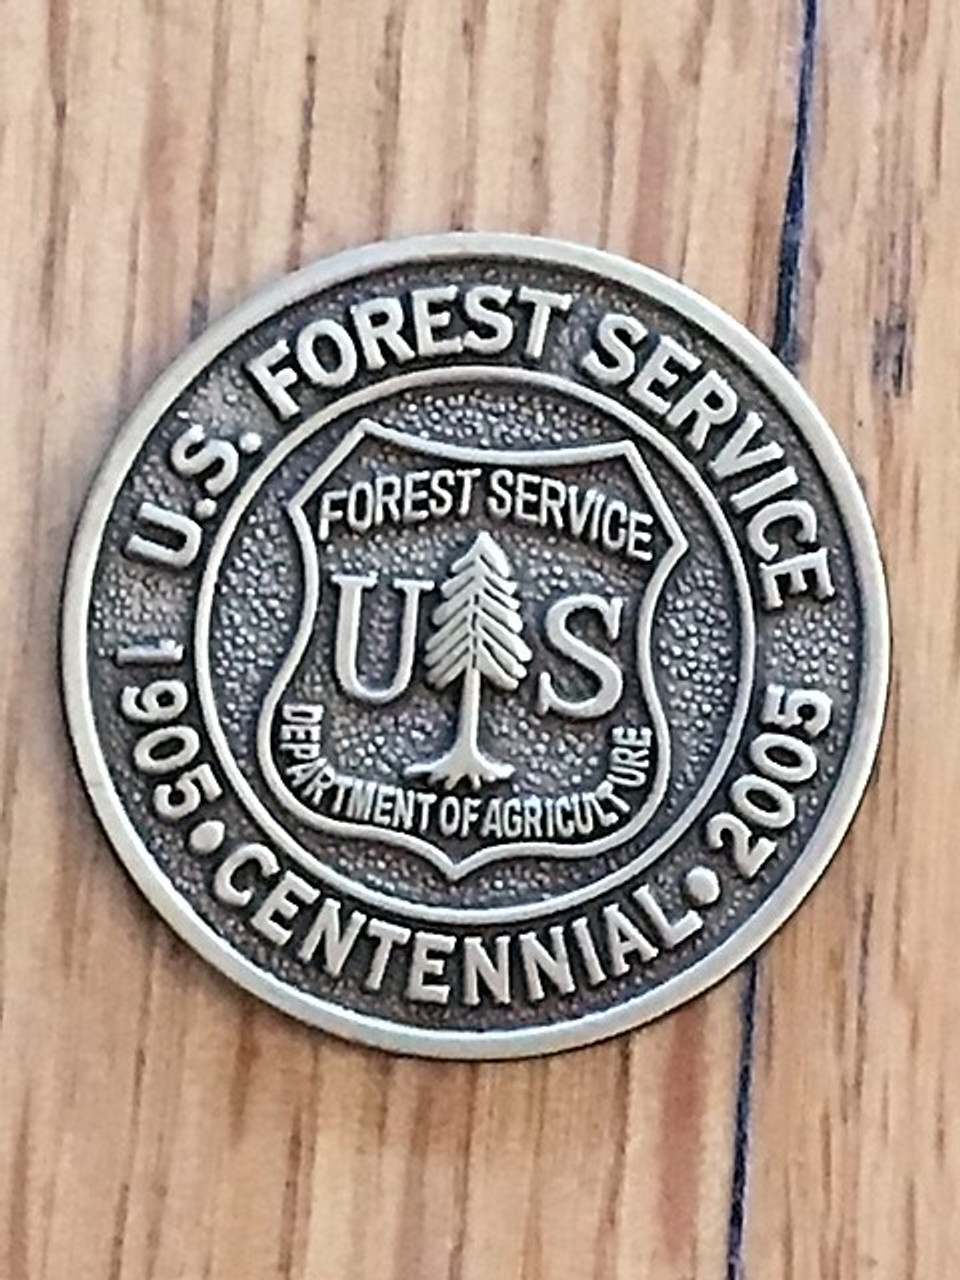 Forest Service 2005 Centennial Spur Set - Limited Edition